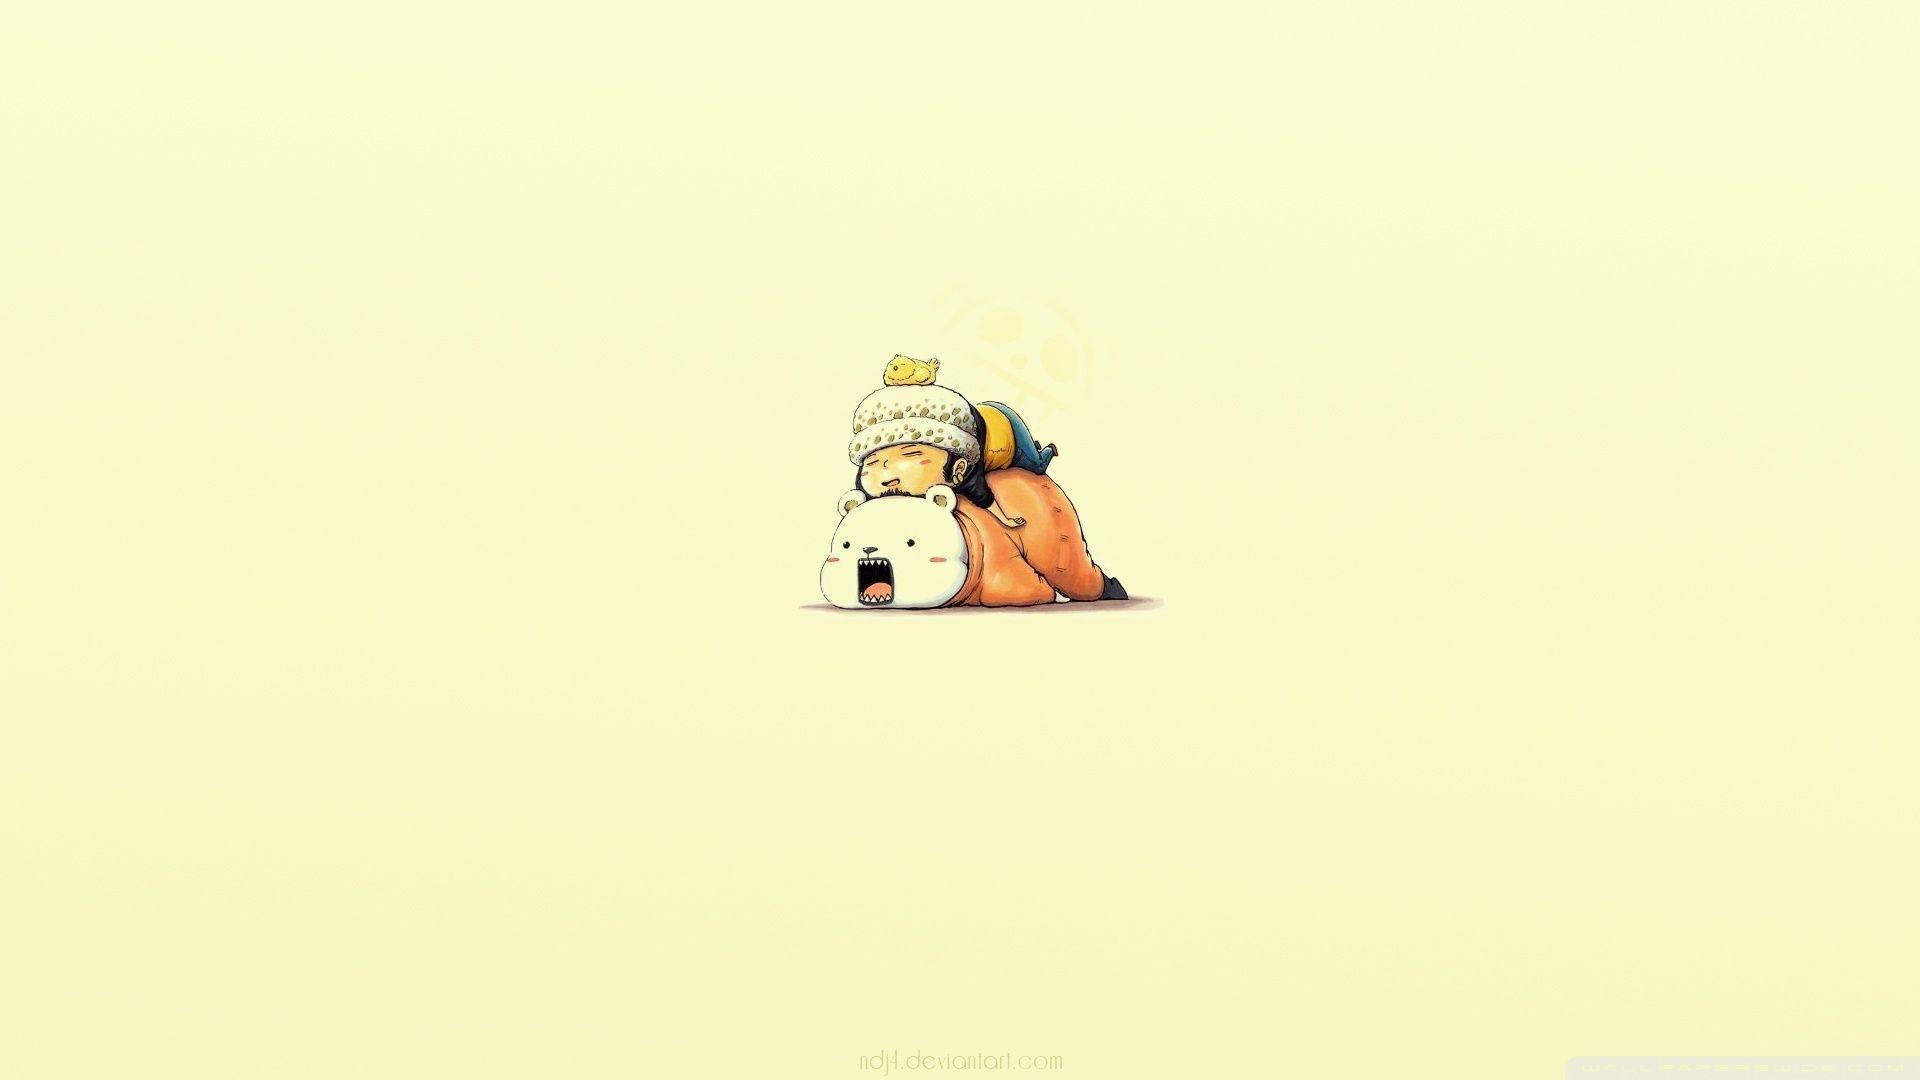 Funny Anime Desktop Wallpapers Top Free Funny Anime Desktop